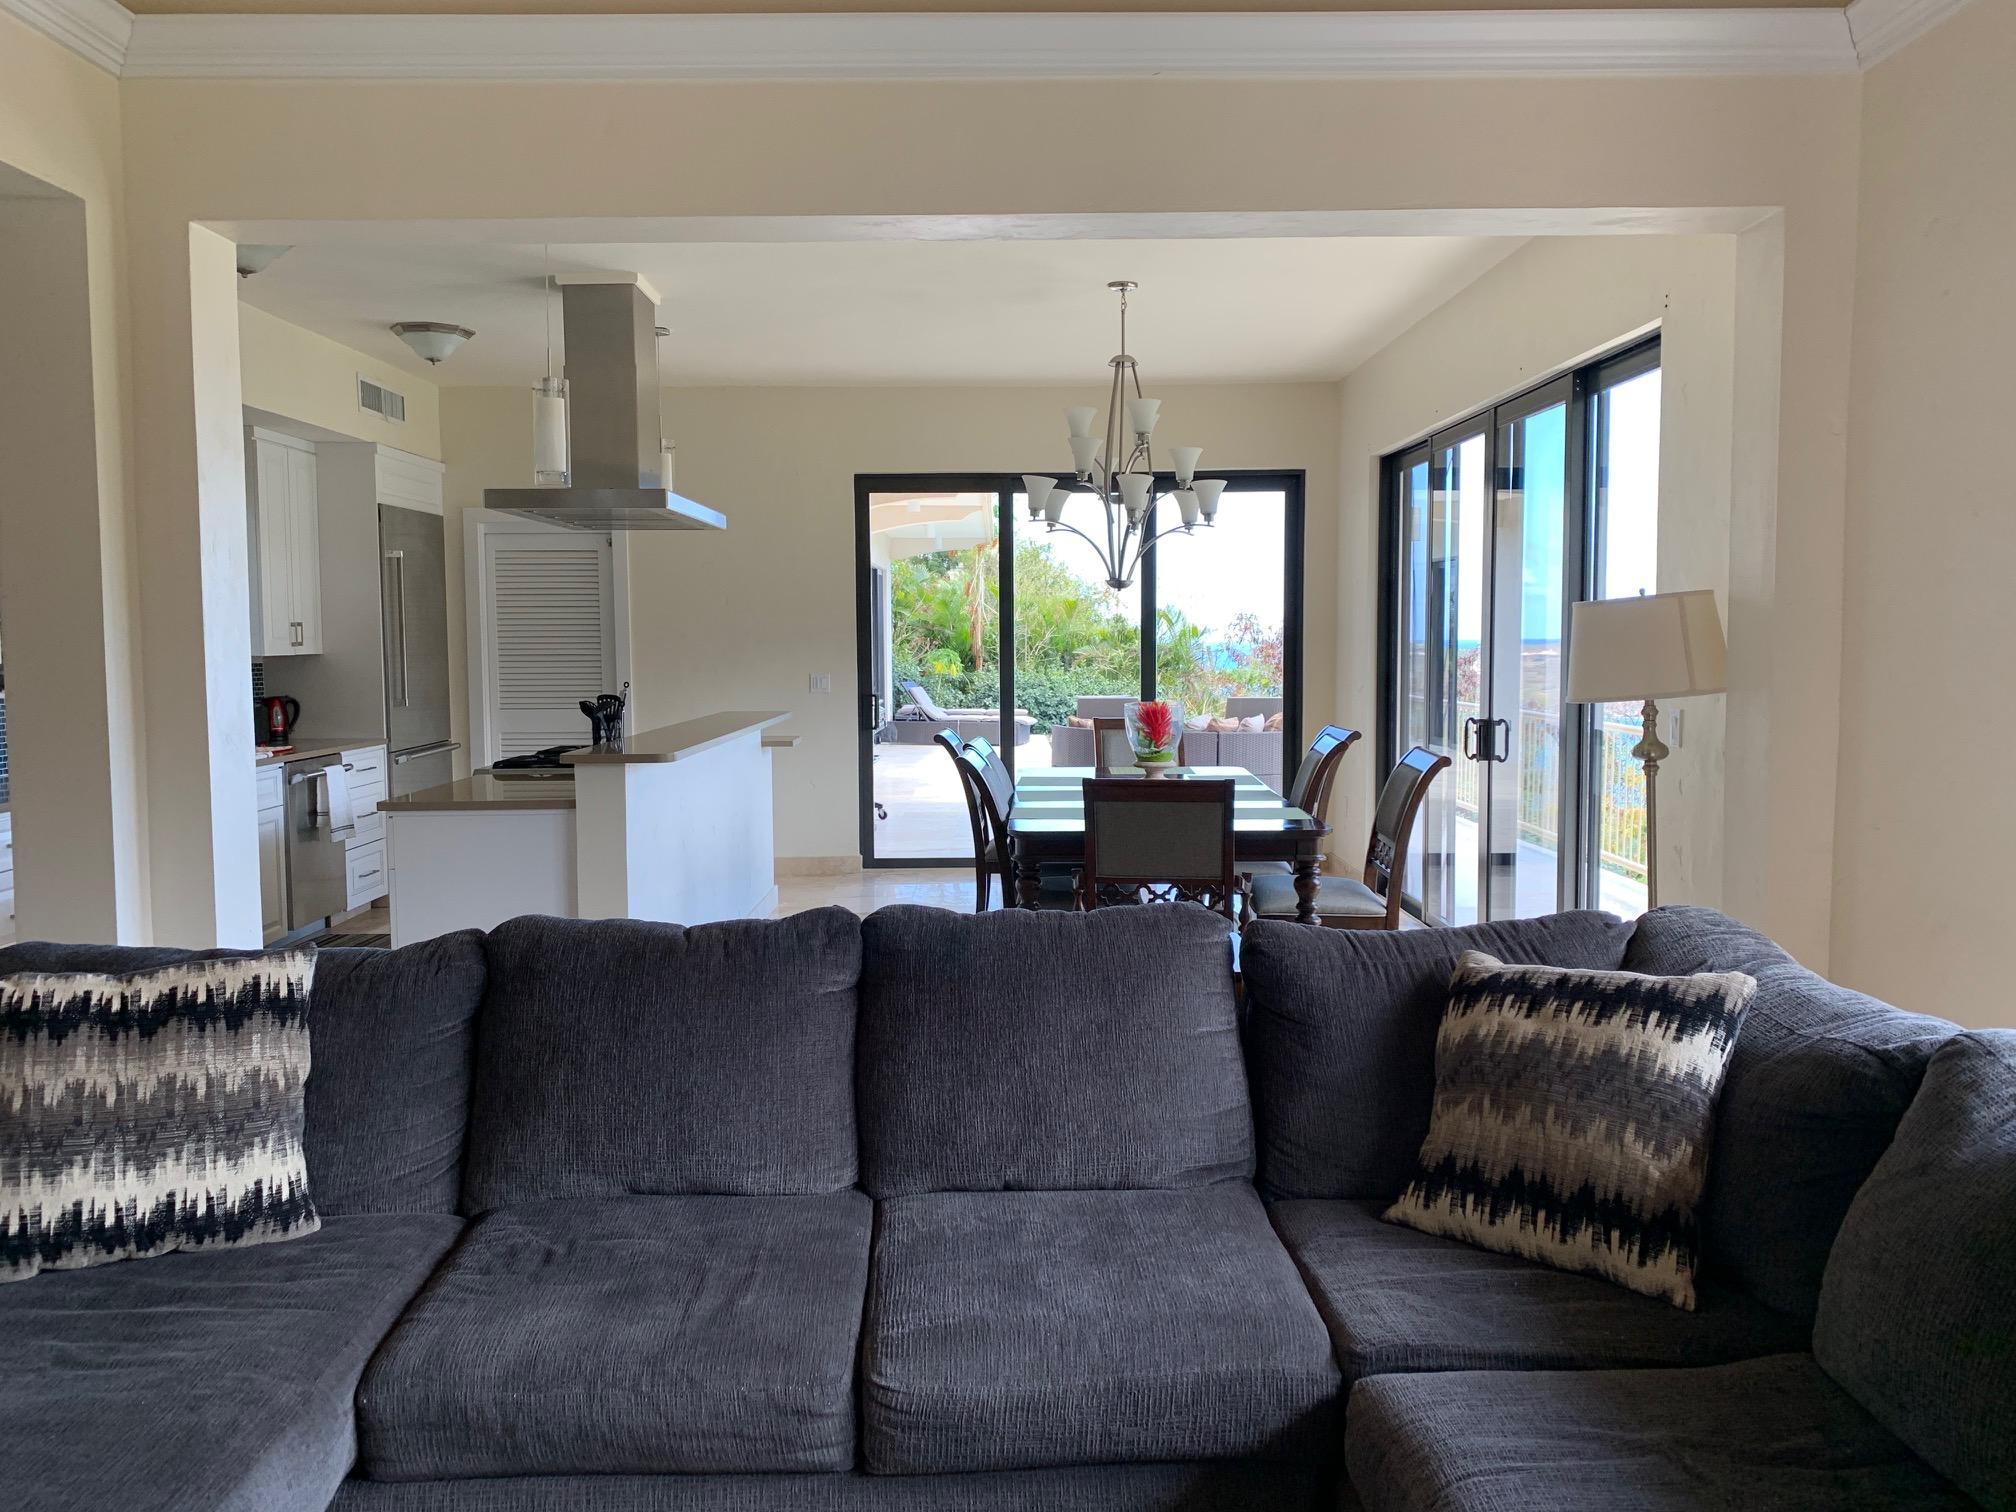 St John, Virgin Islands 00830, 3 Bedrooms Bedrooms, ,3 BathroomsBathrooms,Residential,For Sale,16-426